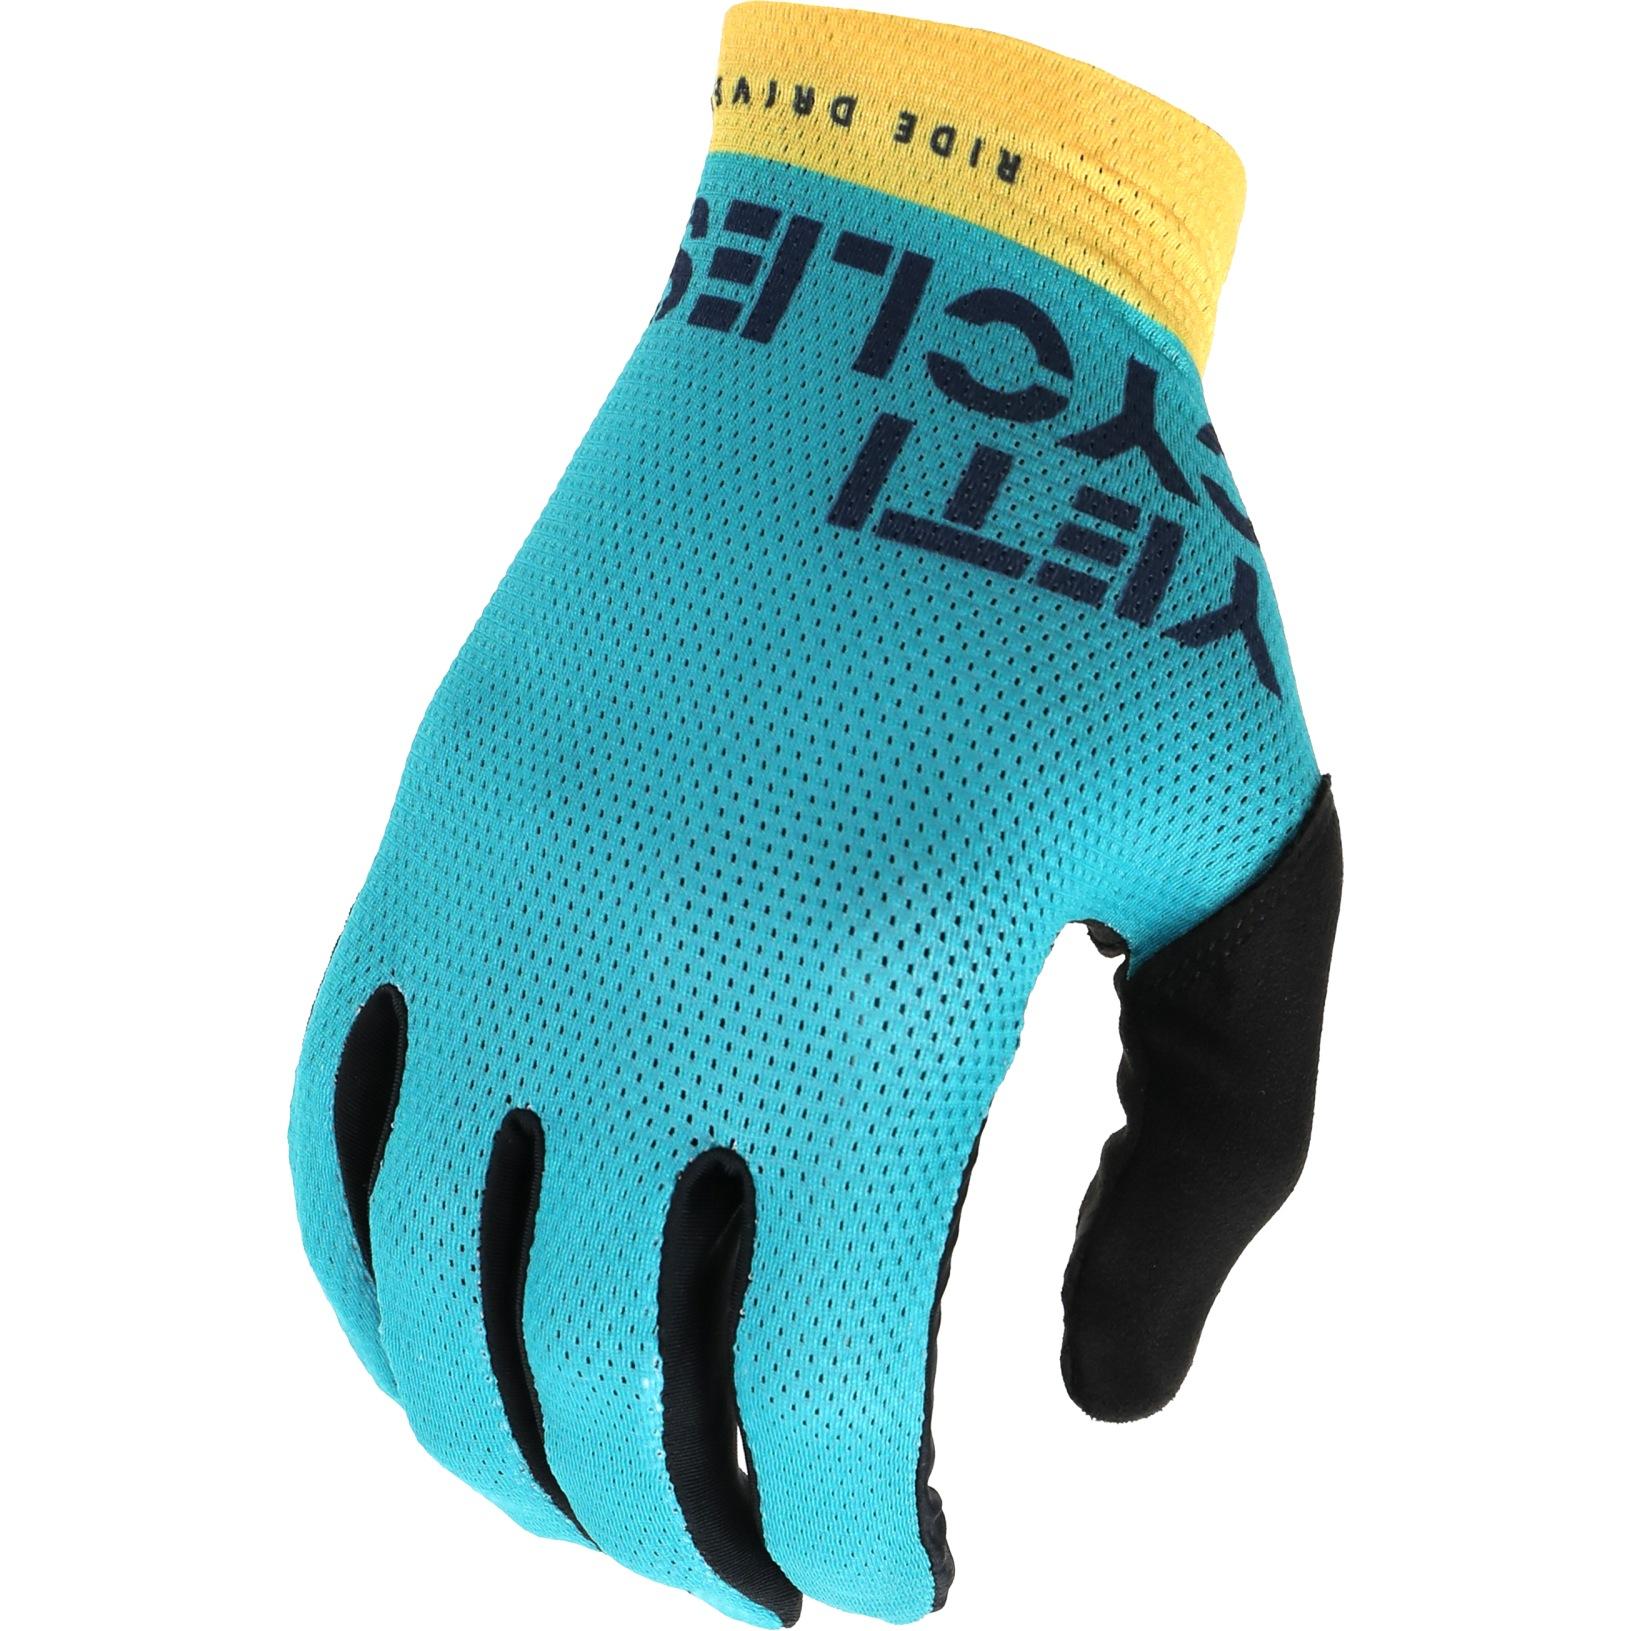 Yeti Cycles Enduro Gloves - Turquoise